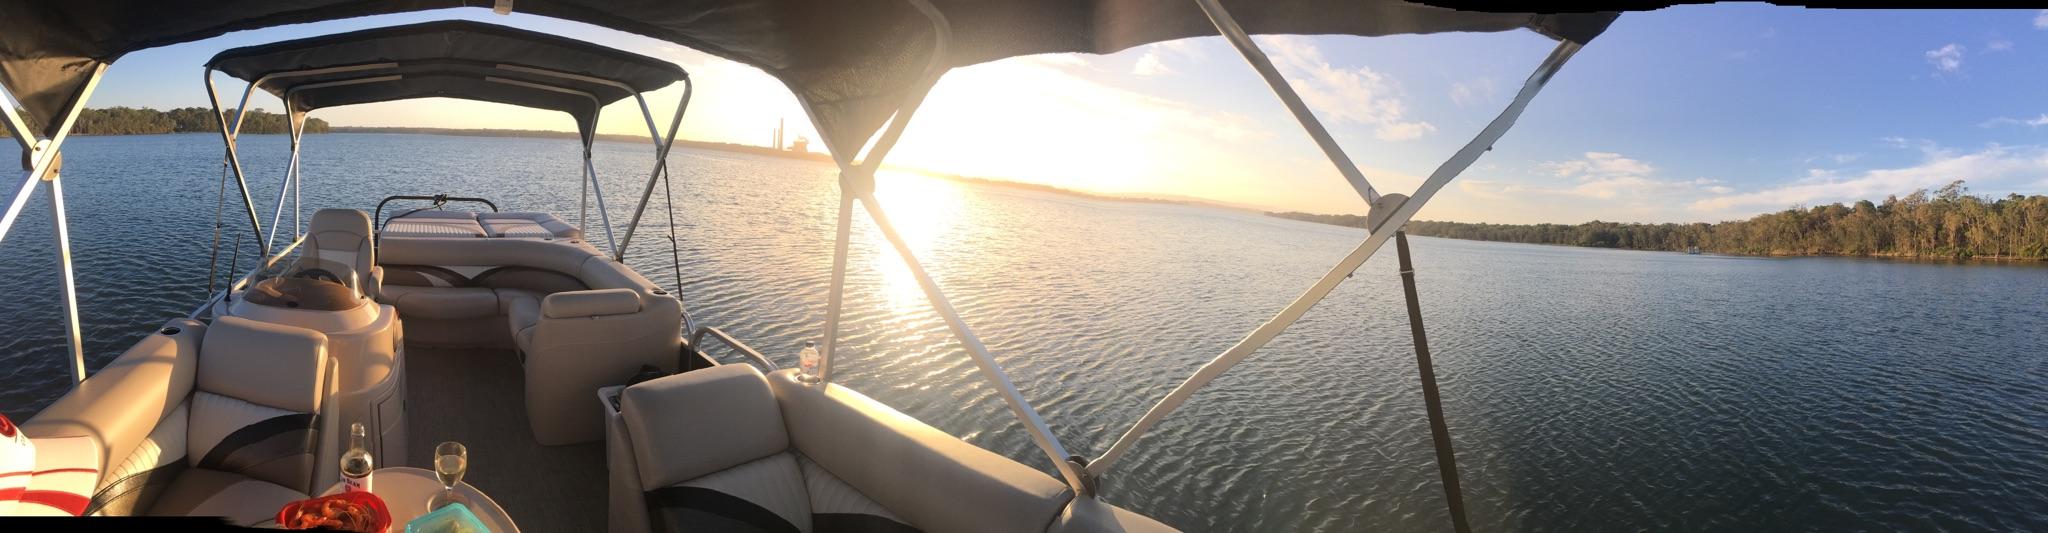 Seeker Pontoon Boats